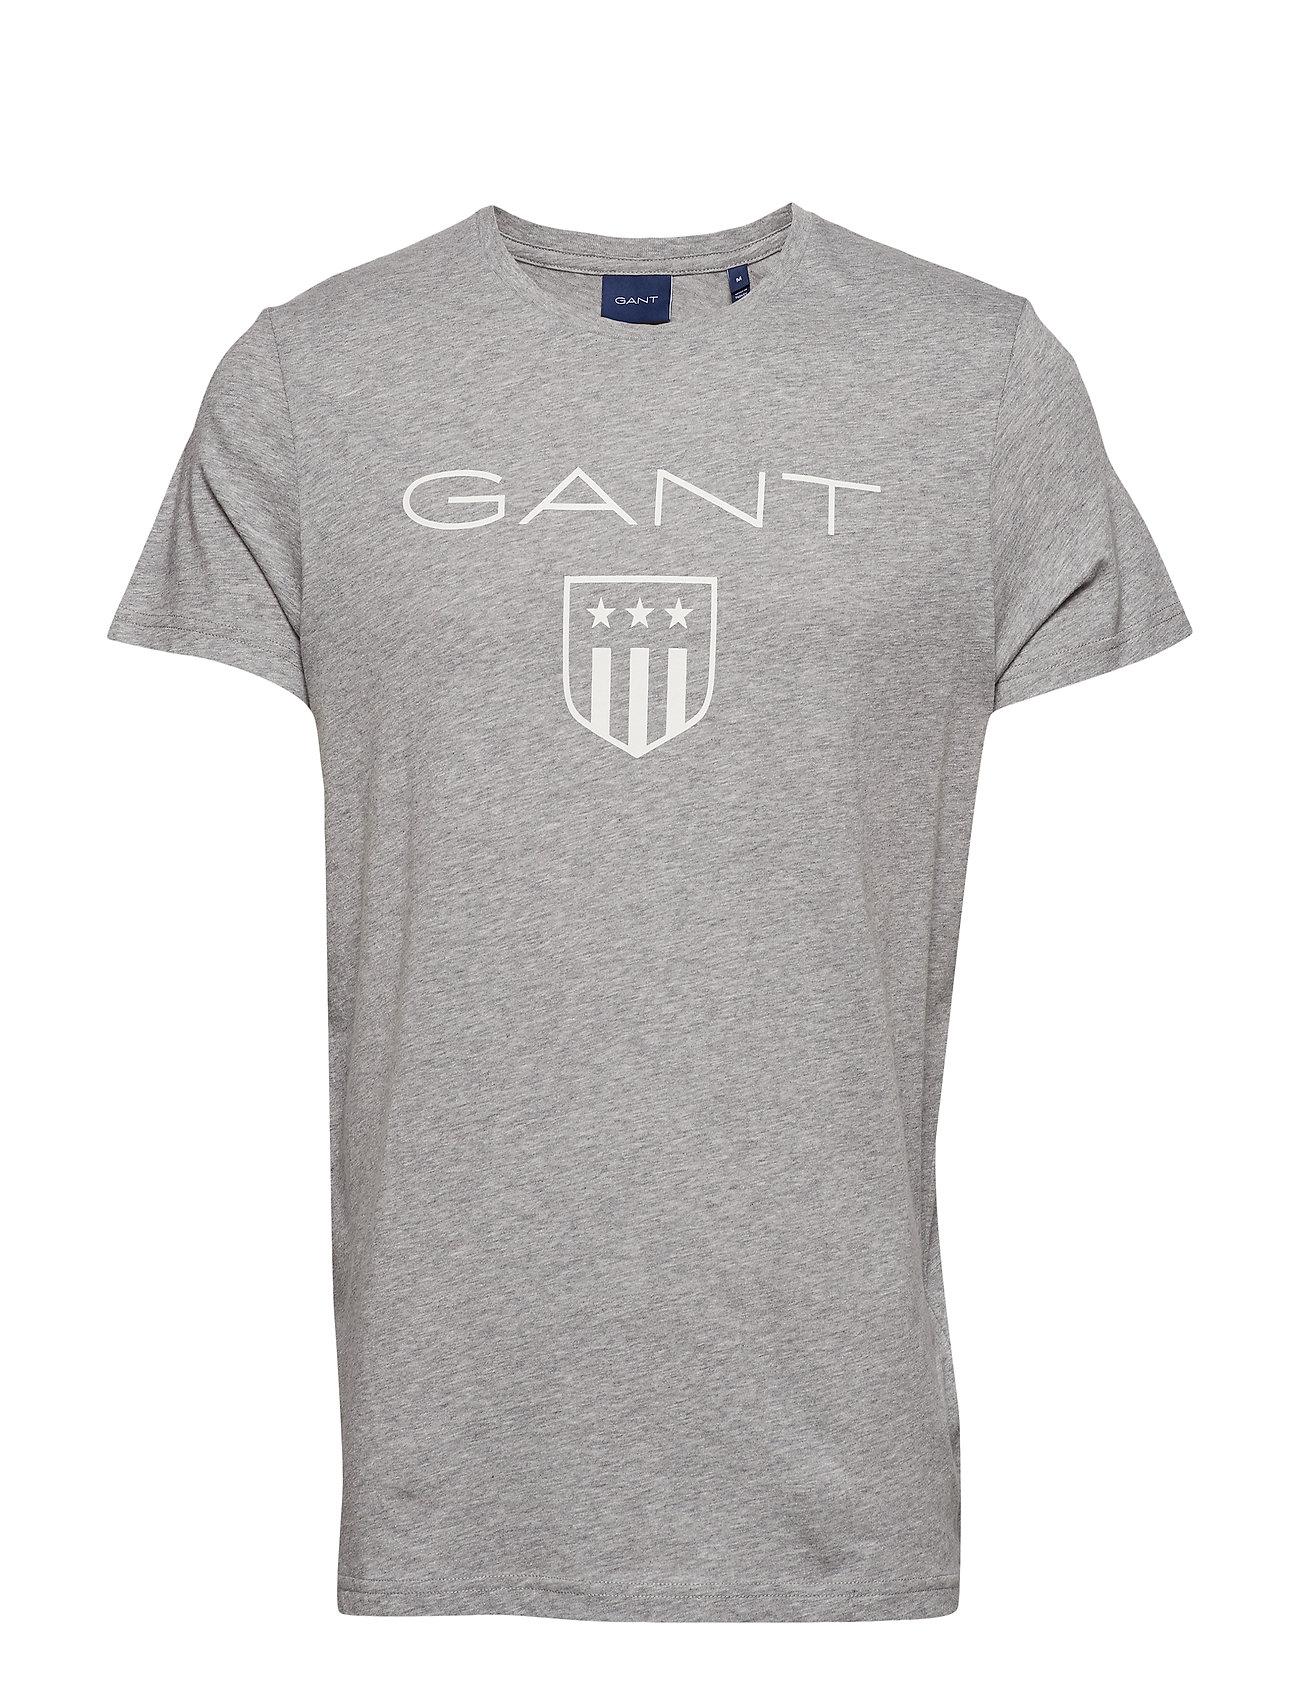 GANT O1. PRINTED GANT SHIELD SS T-SHIRT